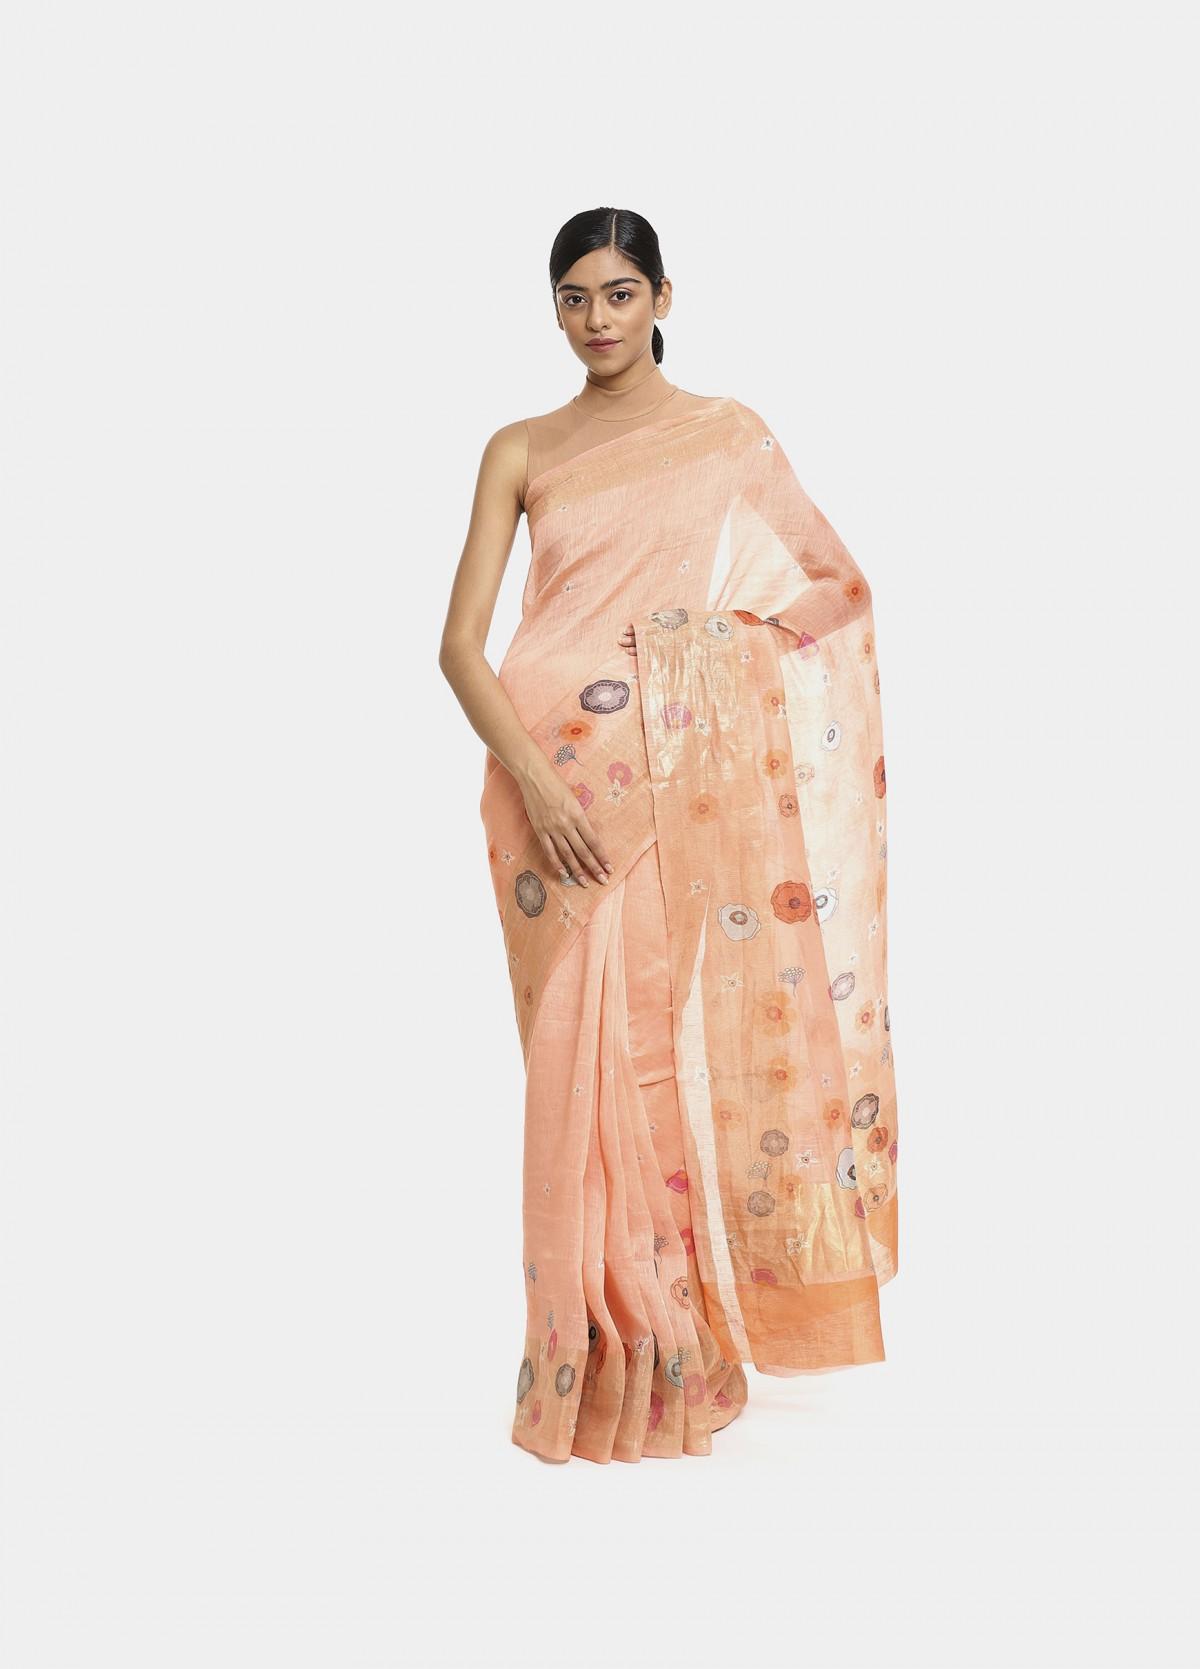 The Gul Sari